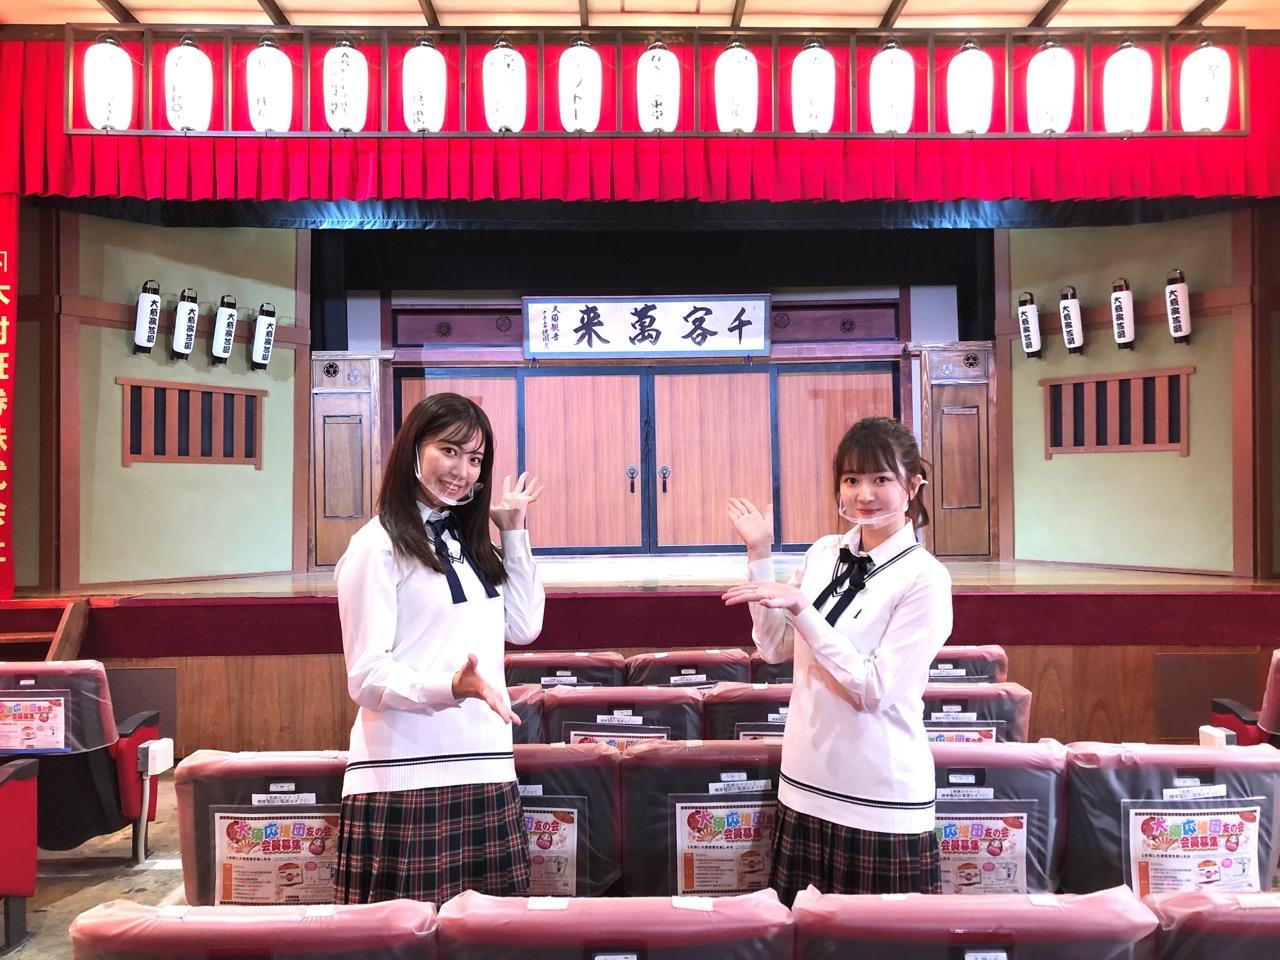 「SKE48は君と歌いたい」荒井優希&江籠裕奈が大須演芸場を訪れる【東海テレビ】